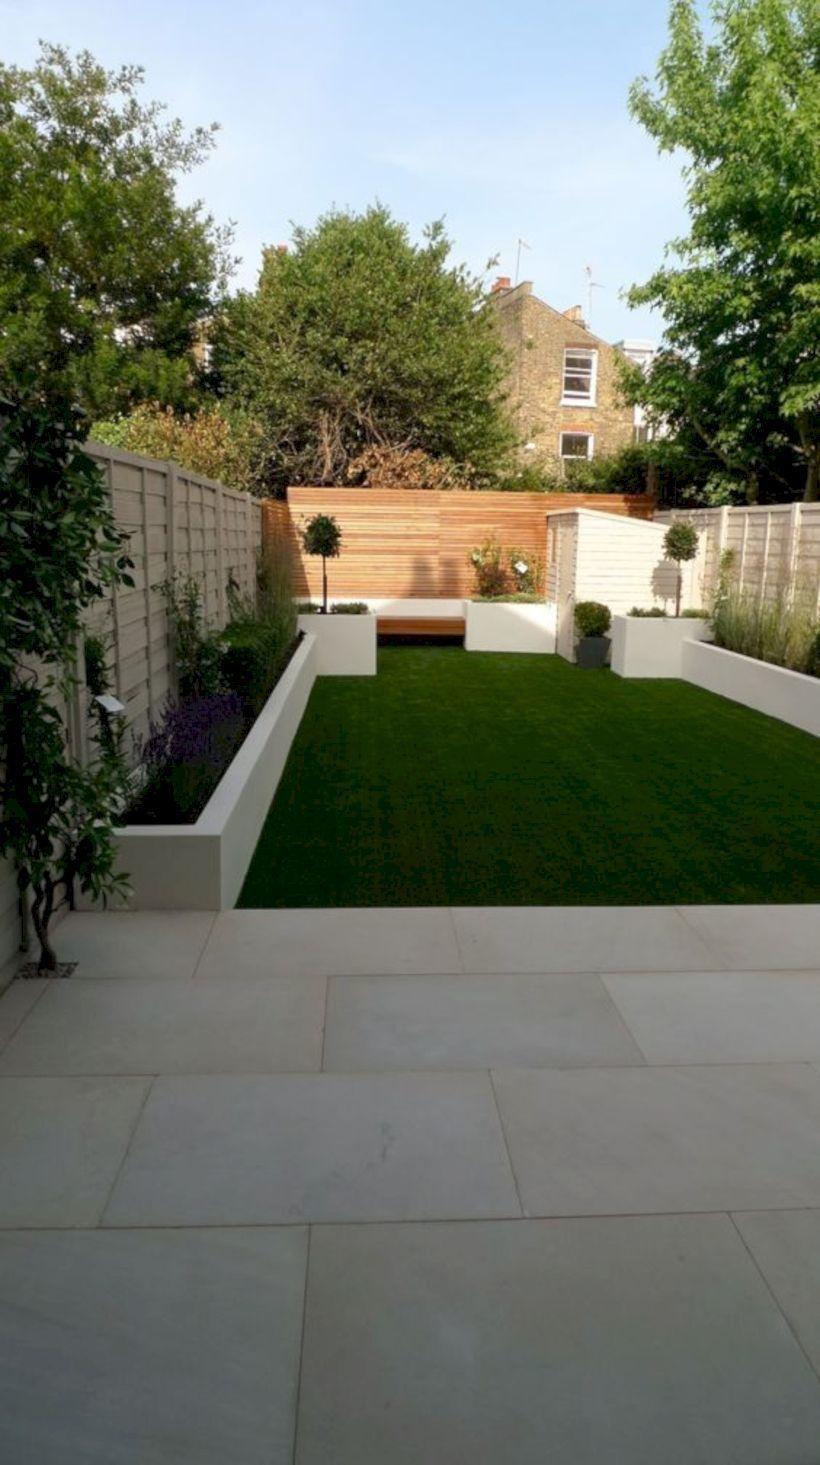 52 Latest Small Courtyard Garden Design Ideas For Your House ... intérieur Creation Petit Jardin